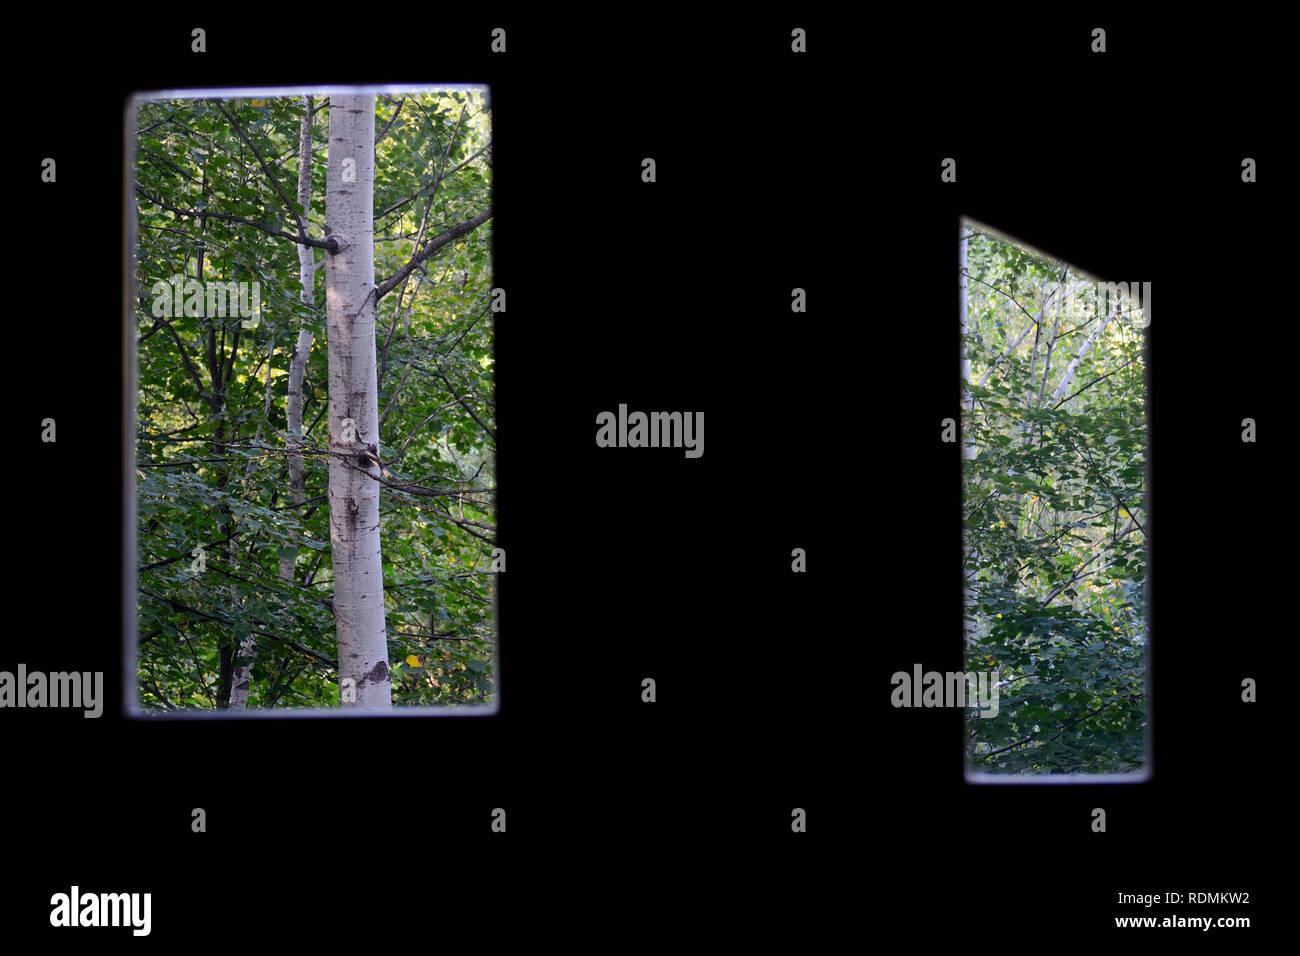 Forrest through windows - Stock Image